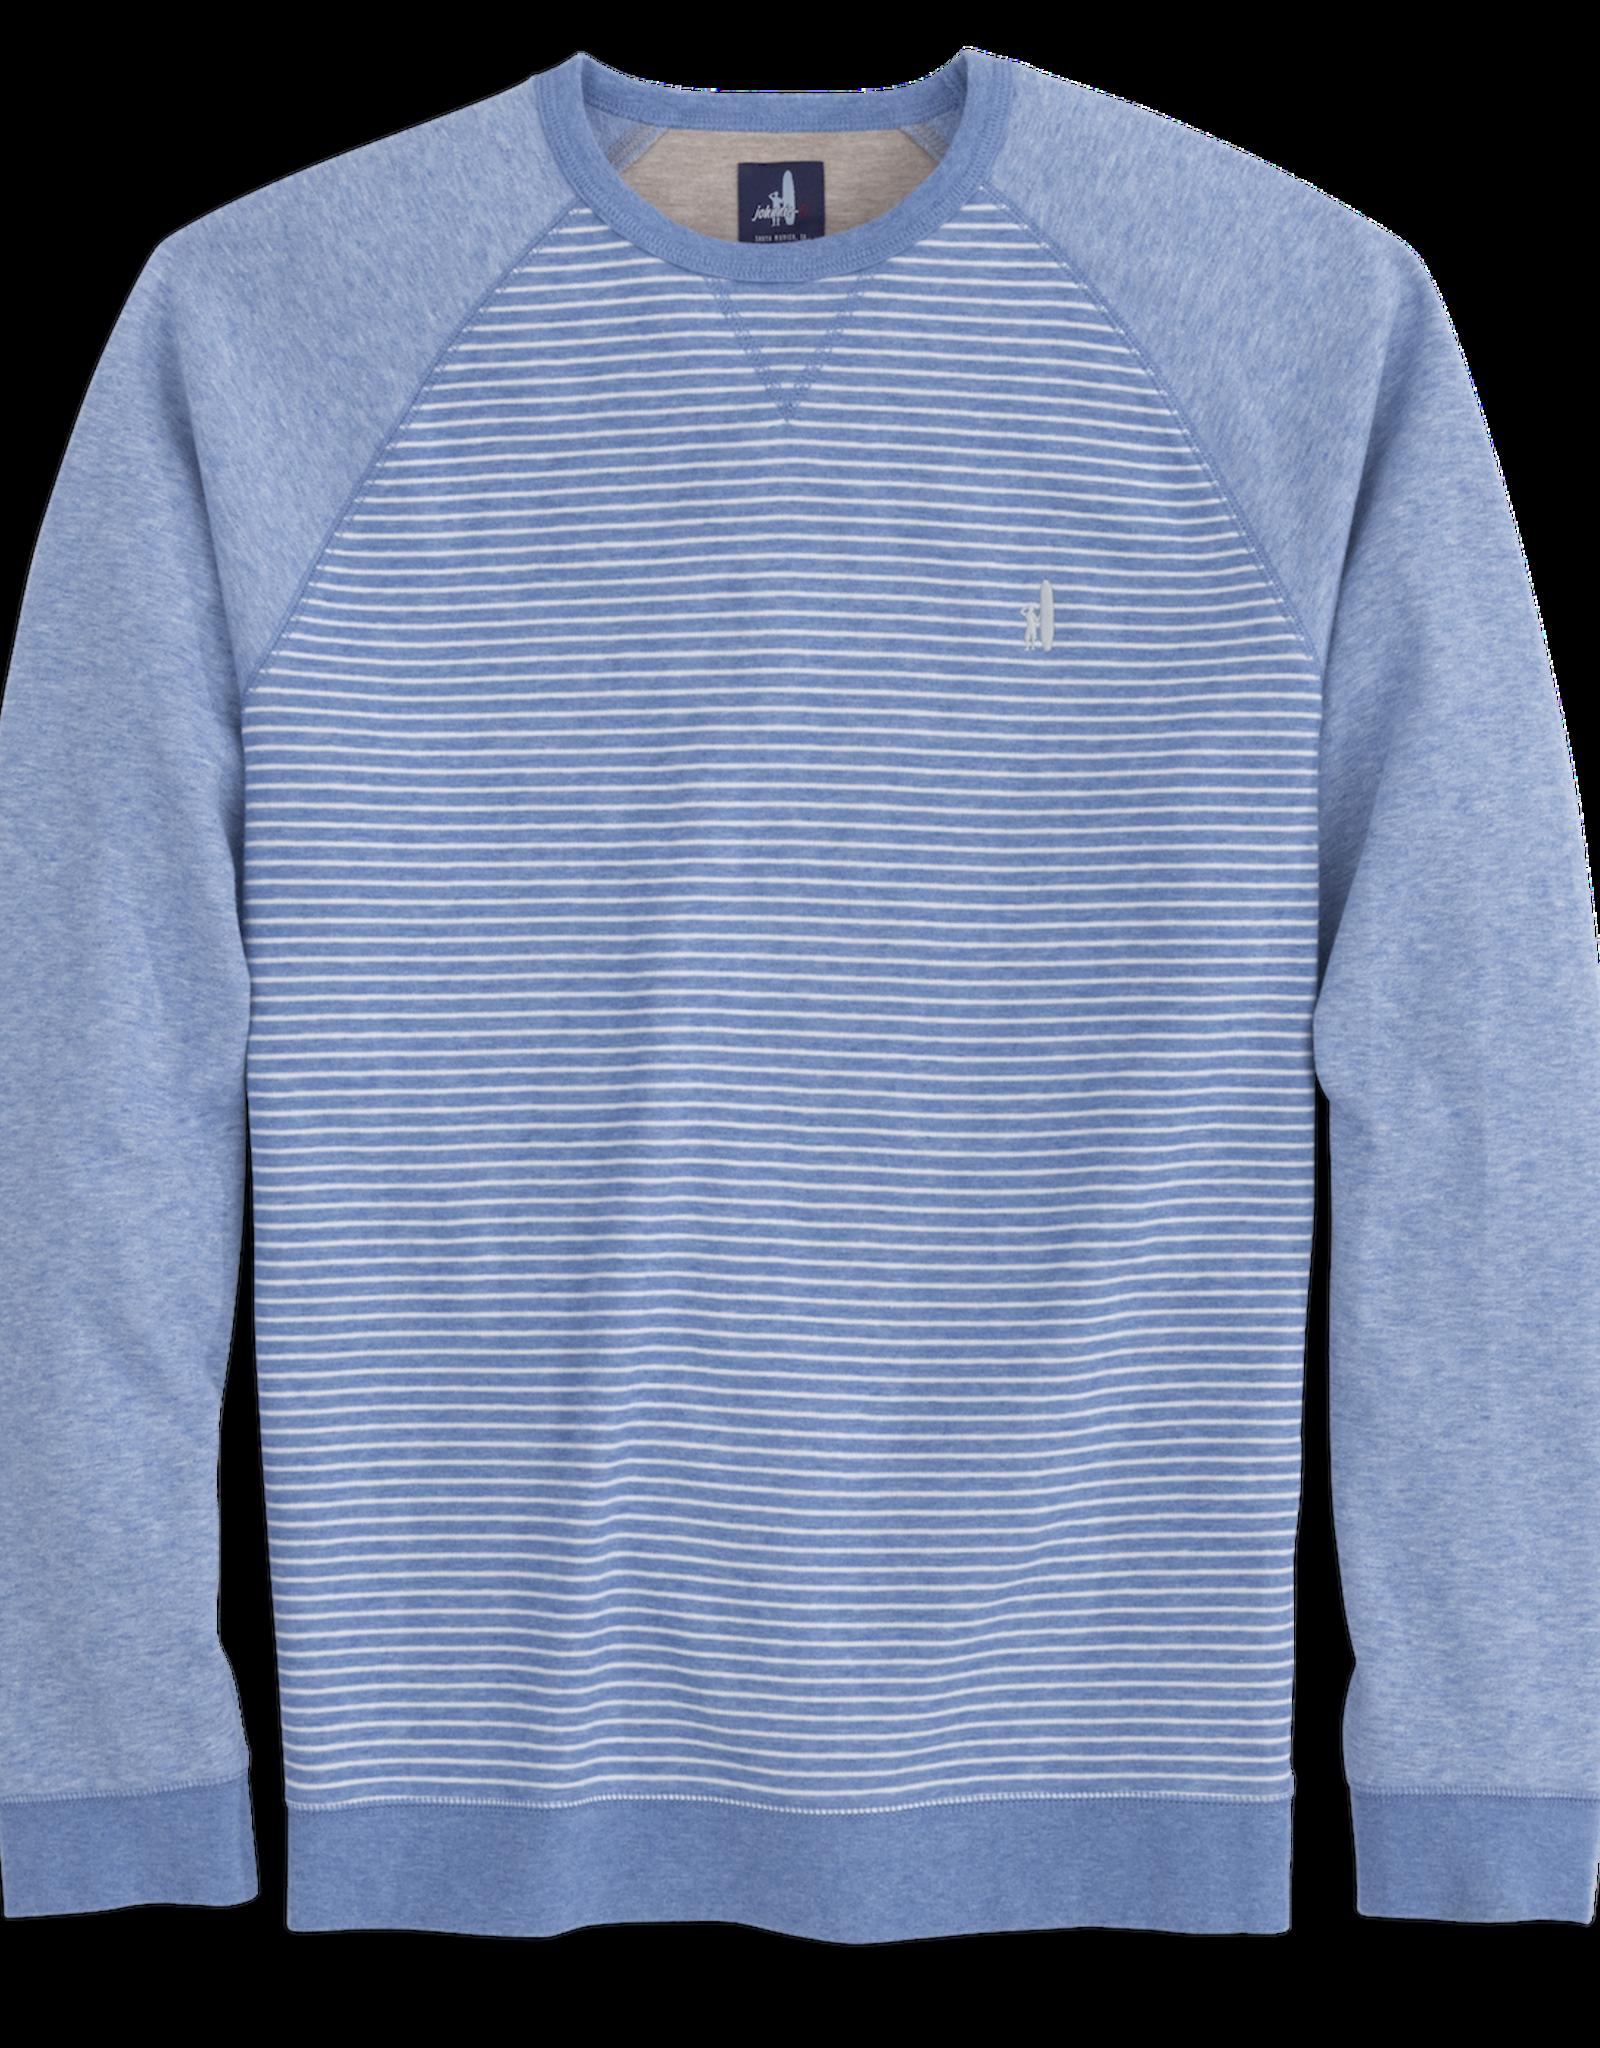 Johnnie-O Spector Sweatshirt